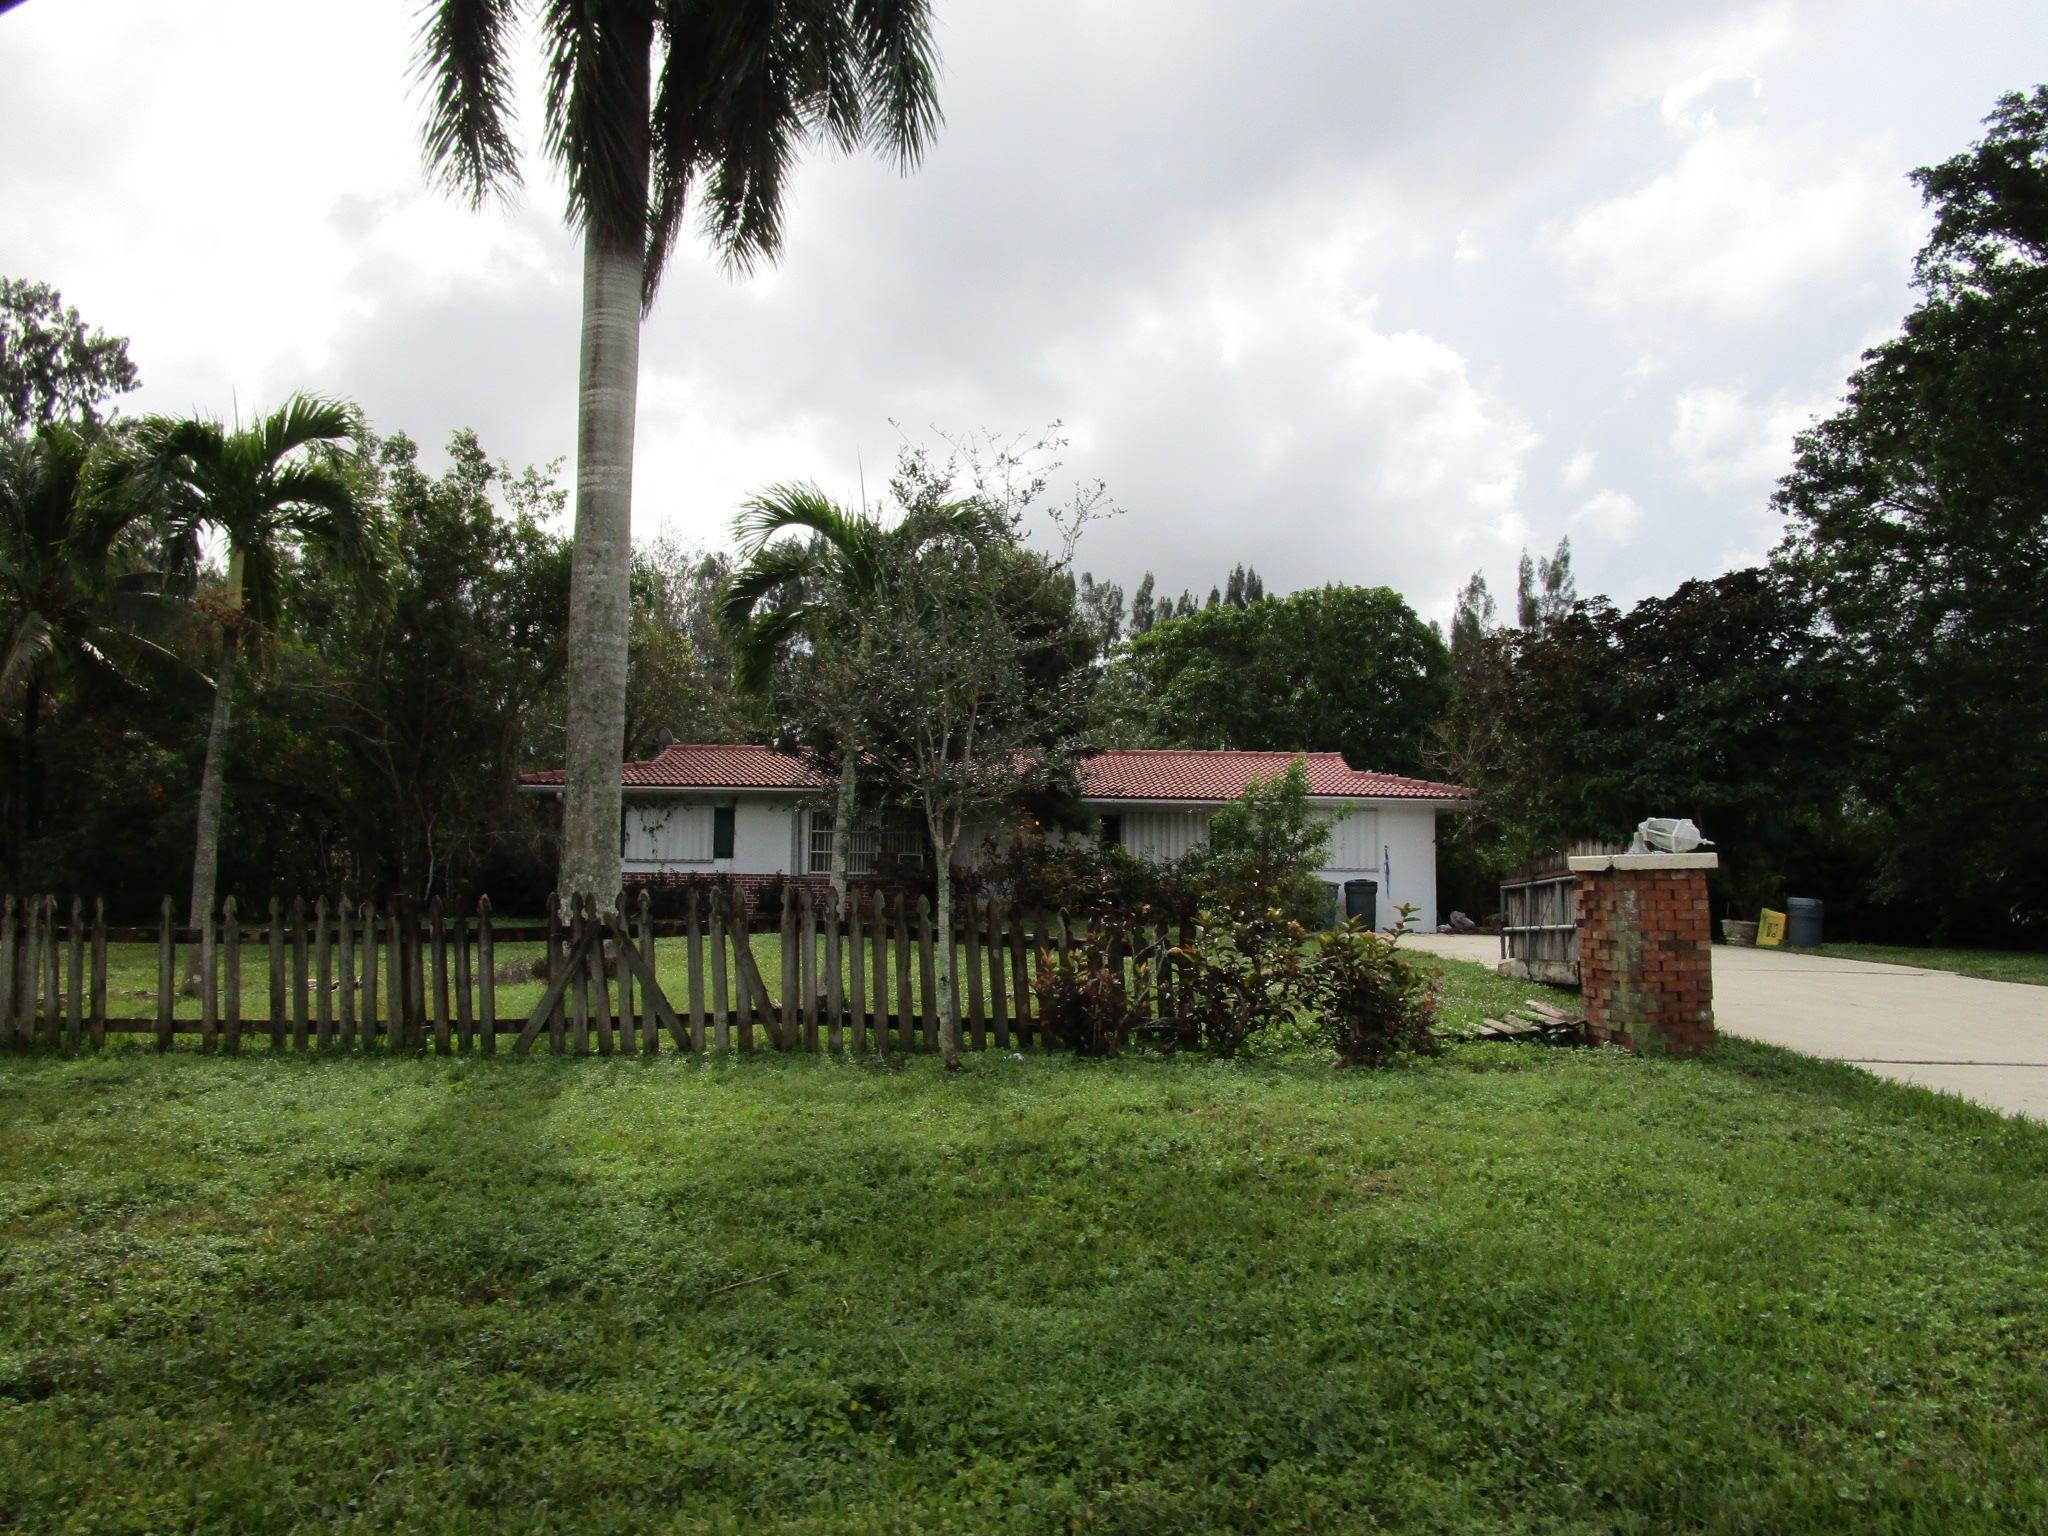 5066 Horseshoe Cir N, West Palm Beach, FL 33417 - Estimate and Home ...